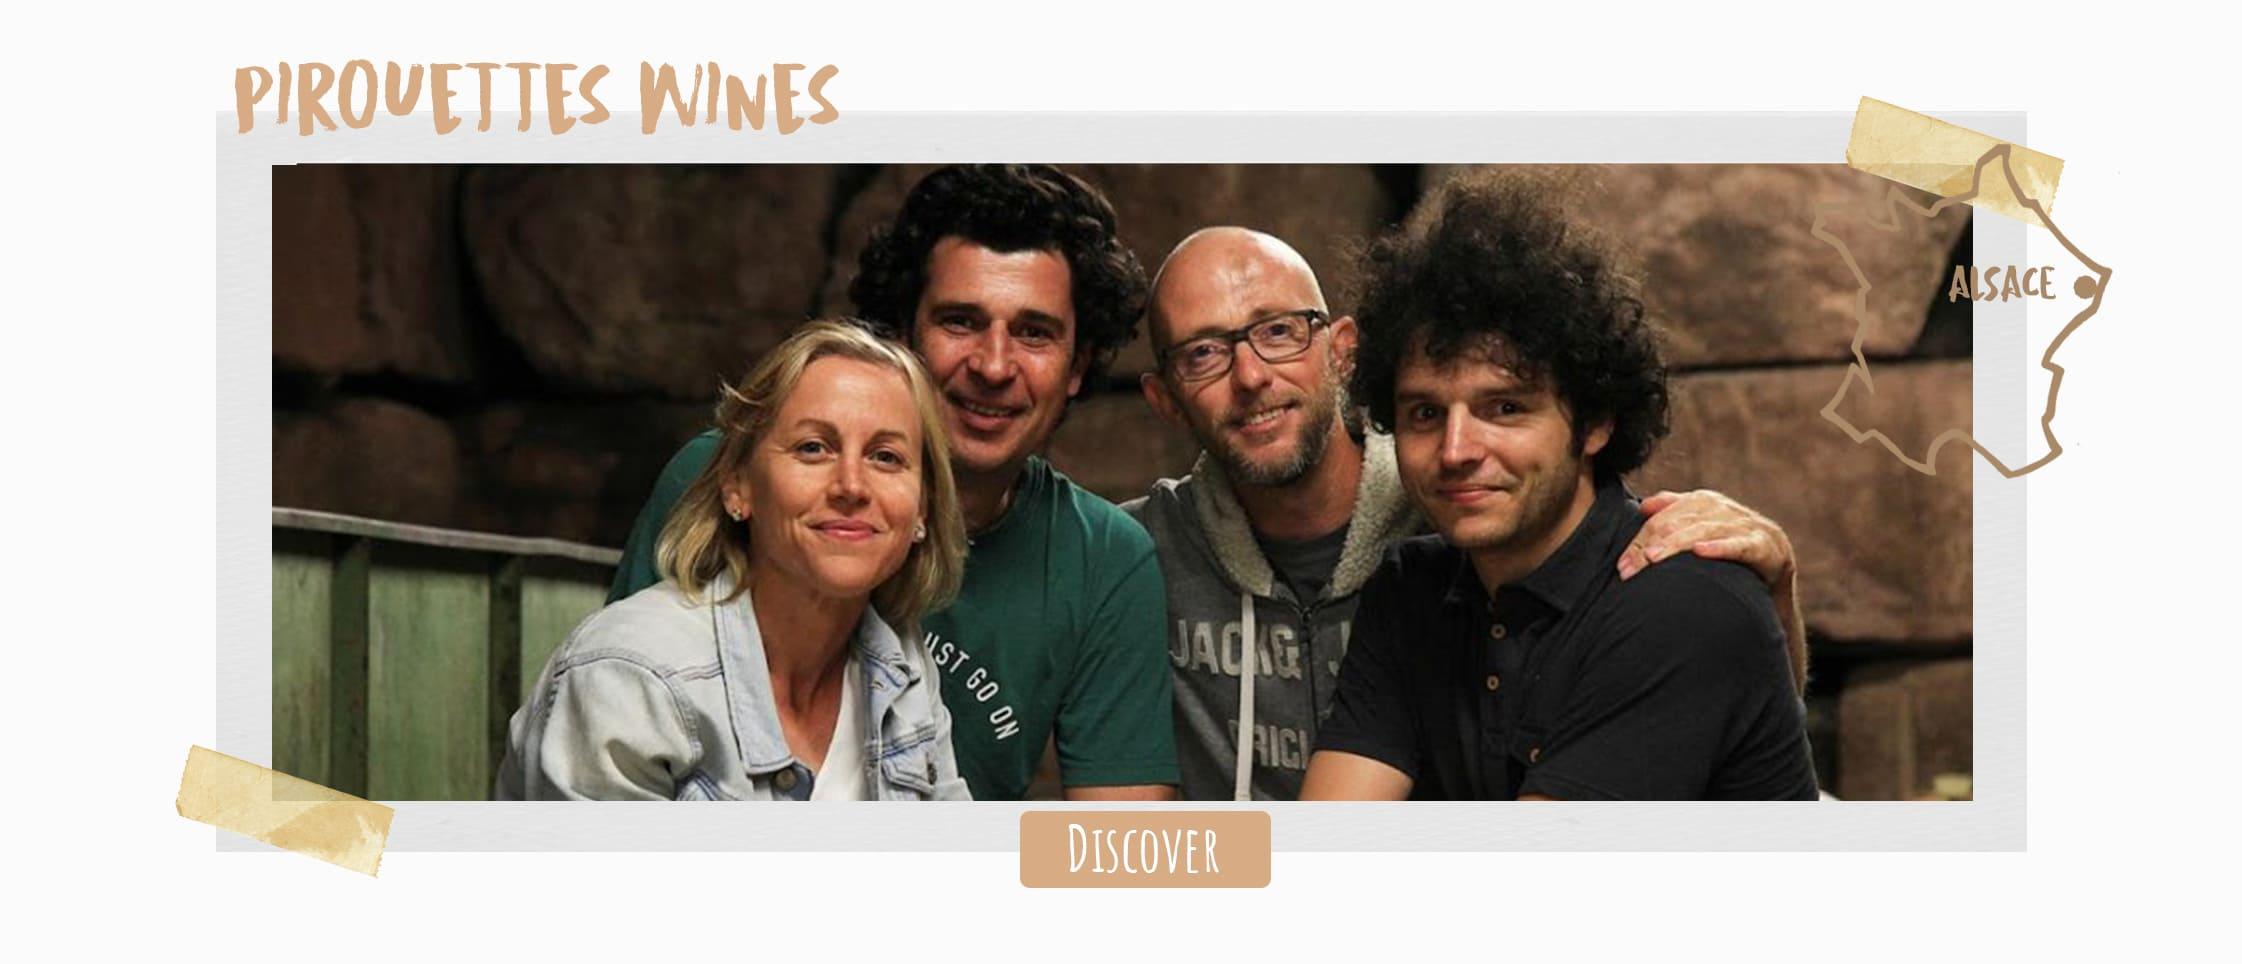 Pirouettes wines